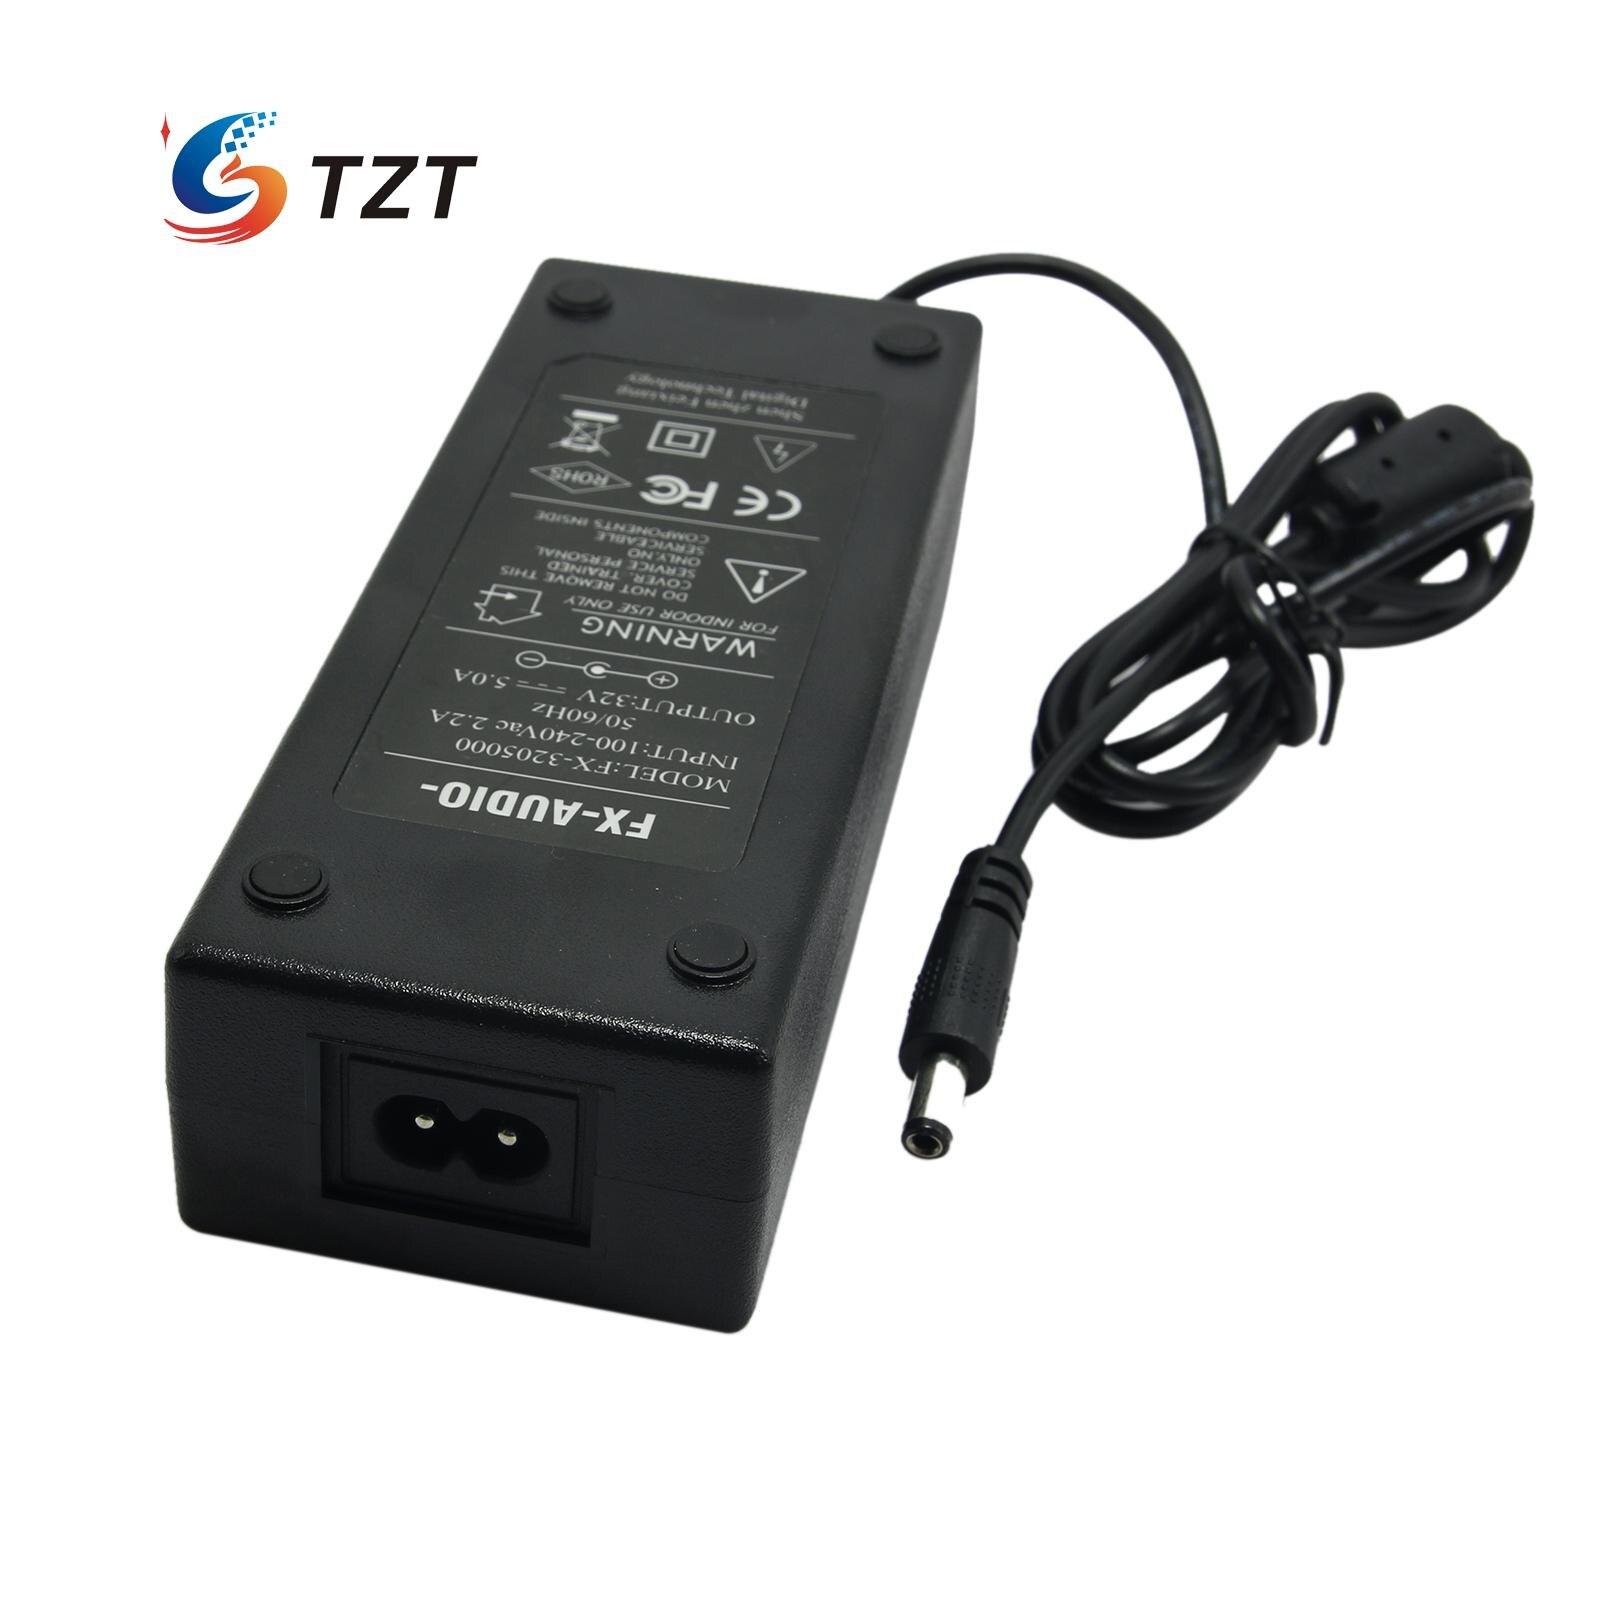 FX Audio D802 HIFI Digital Amplifier Remote Control USB Optical Fiber Coaxial Input 192KHZ 80W*2 with/No Power Supply